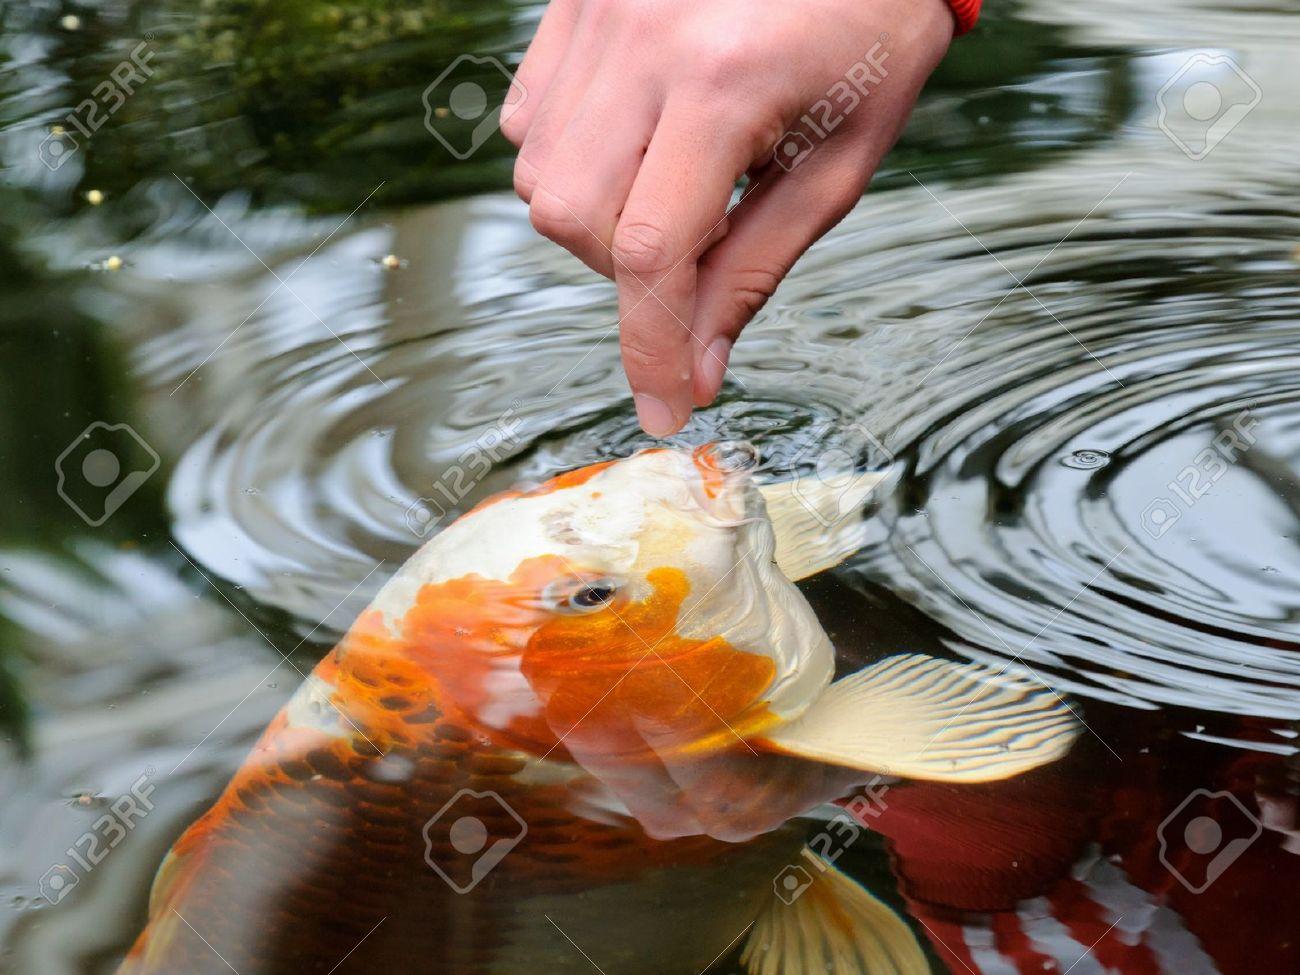 alimentar a la carpa koi con la mano cyprinus rubrofuscus foto de archivo